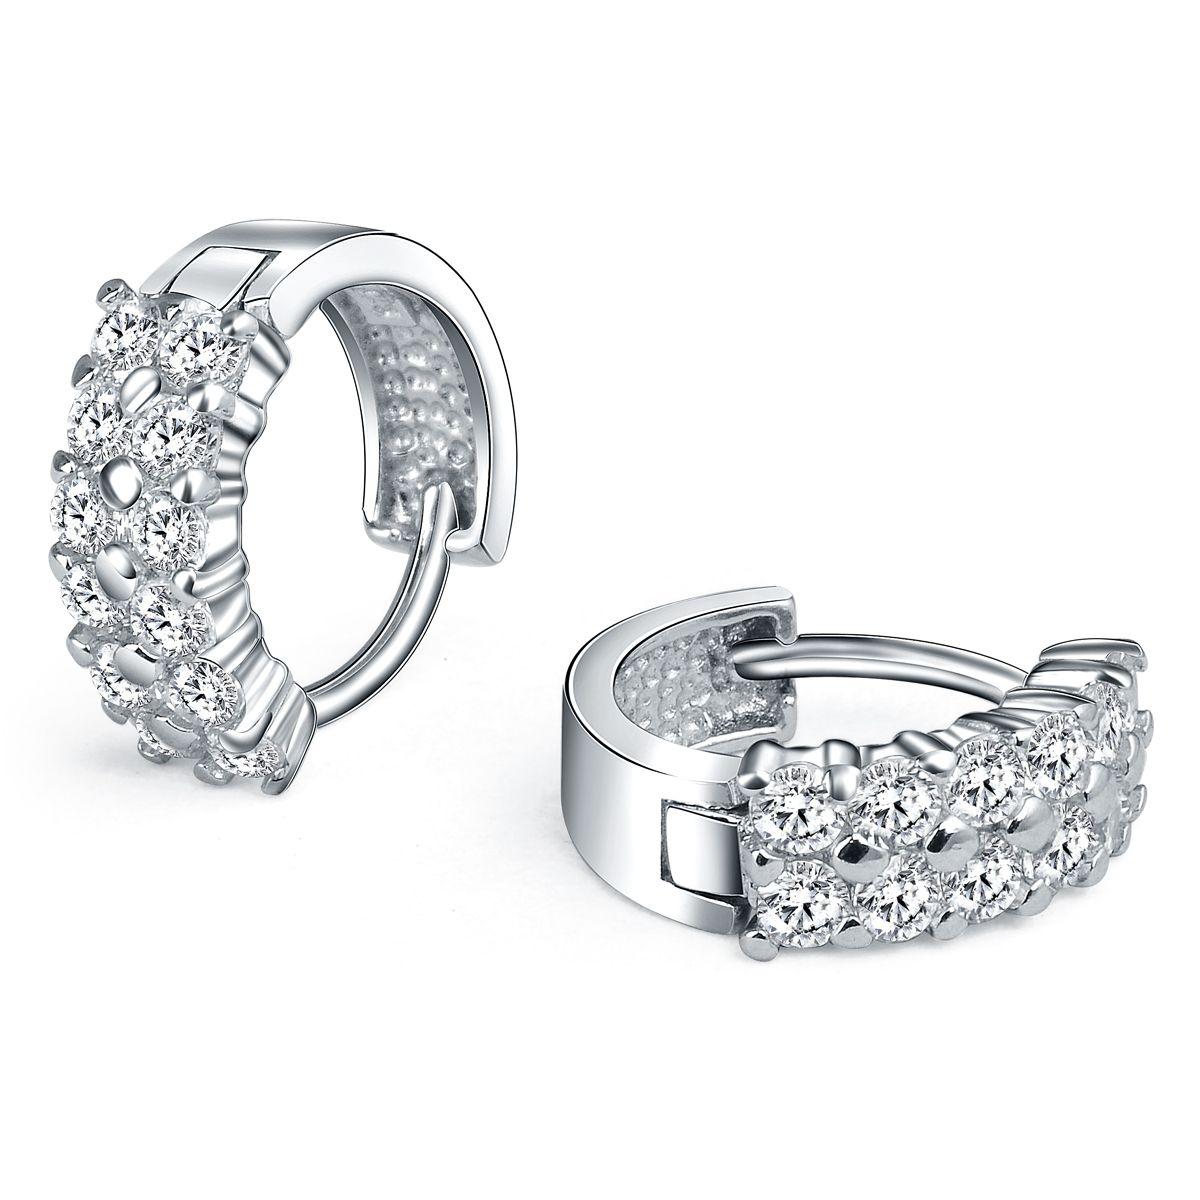 silver diamond hoop earrings see more amazing jewelry at goldenjewelrynet - Earring Design Ideas